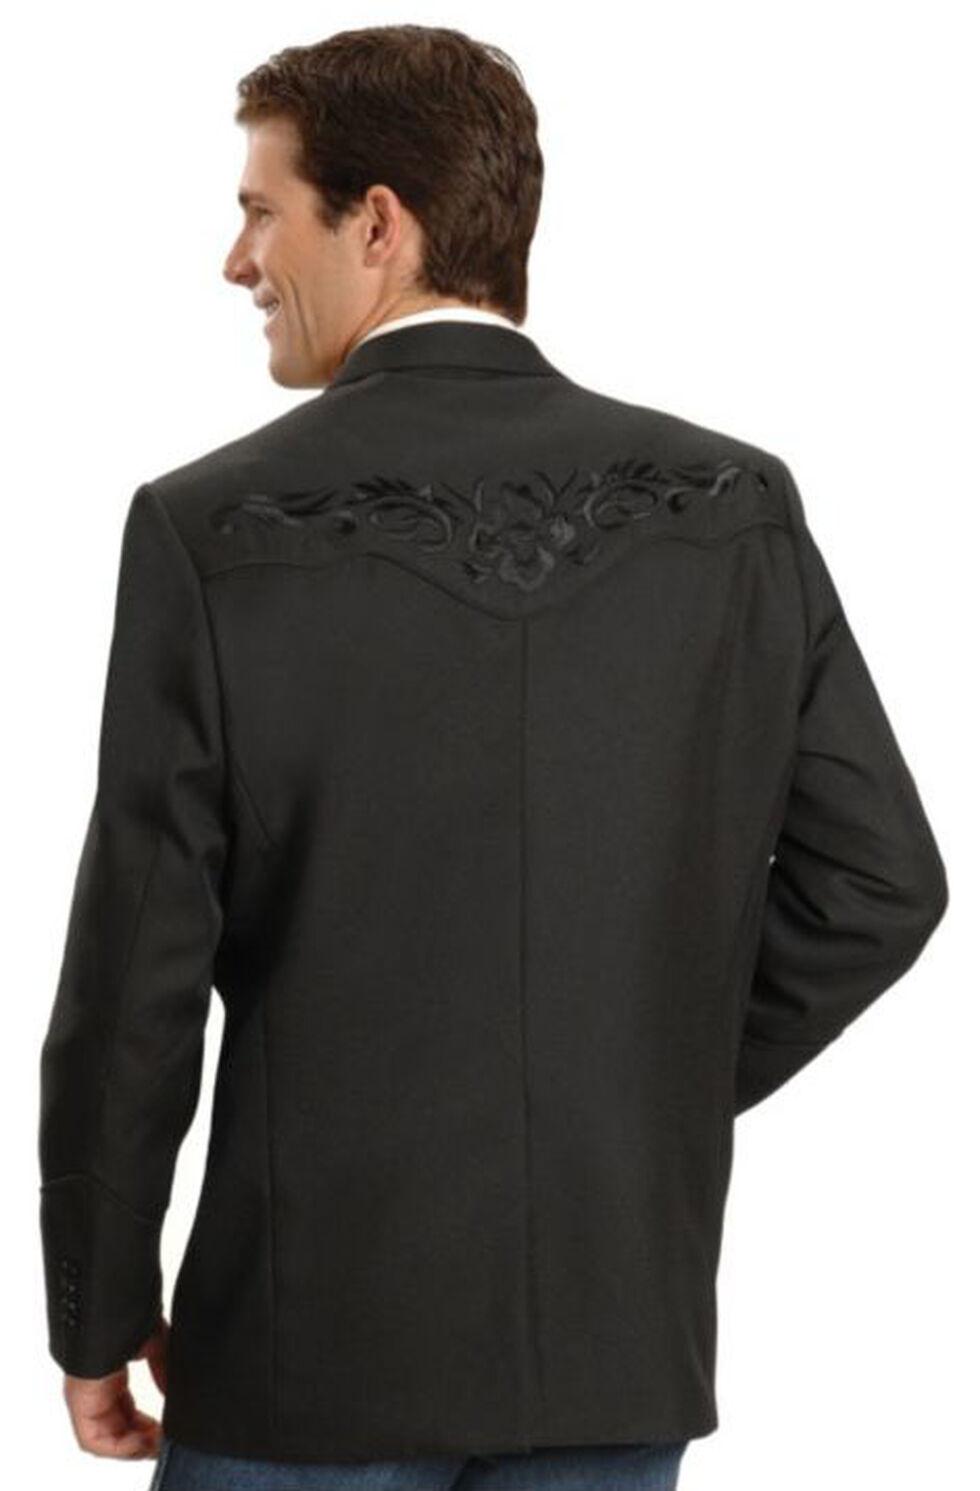 Scully Black Floral Embroidered Western Jacket - Big & Tall, Black, hi-res